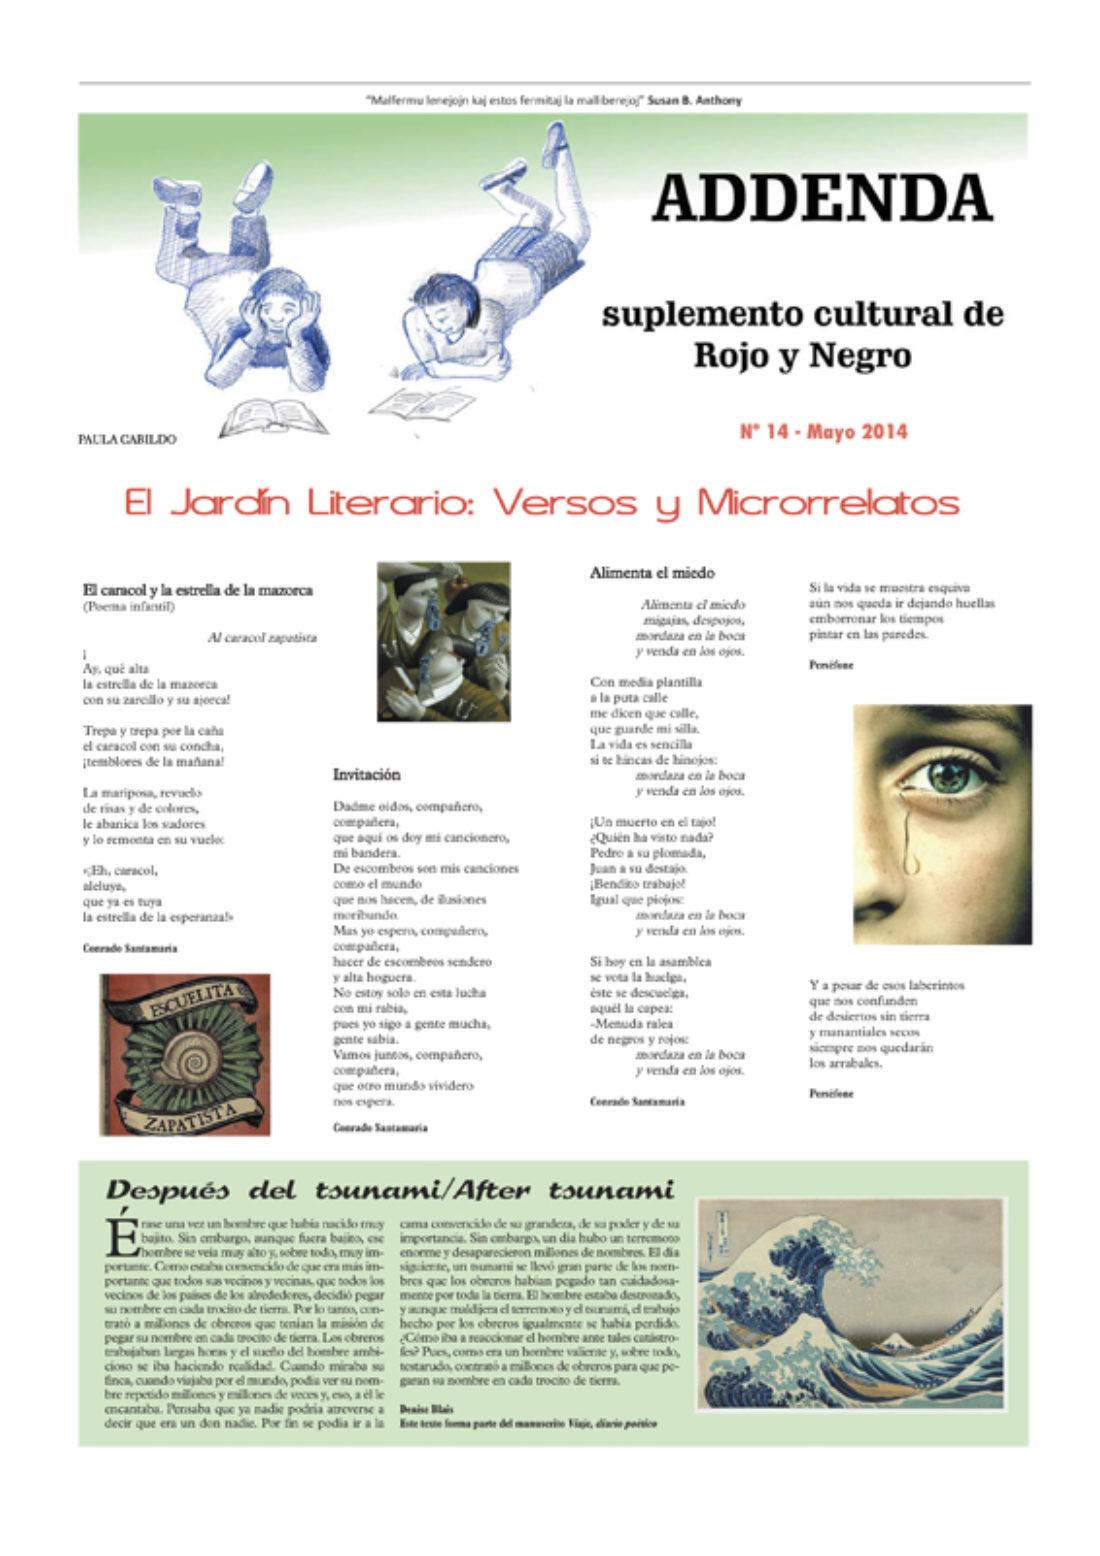 Addenda, suplemento cultural del RyN – Nº 14, mayo 2014